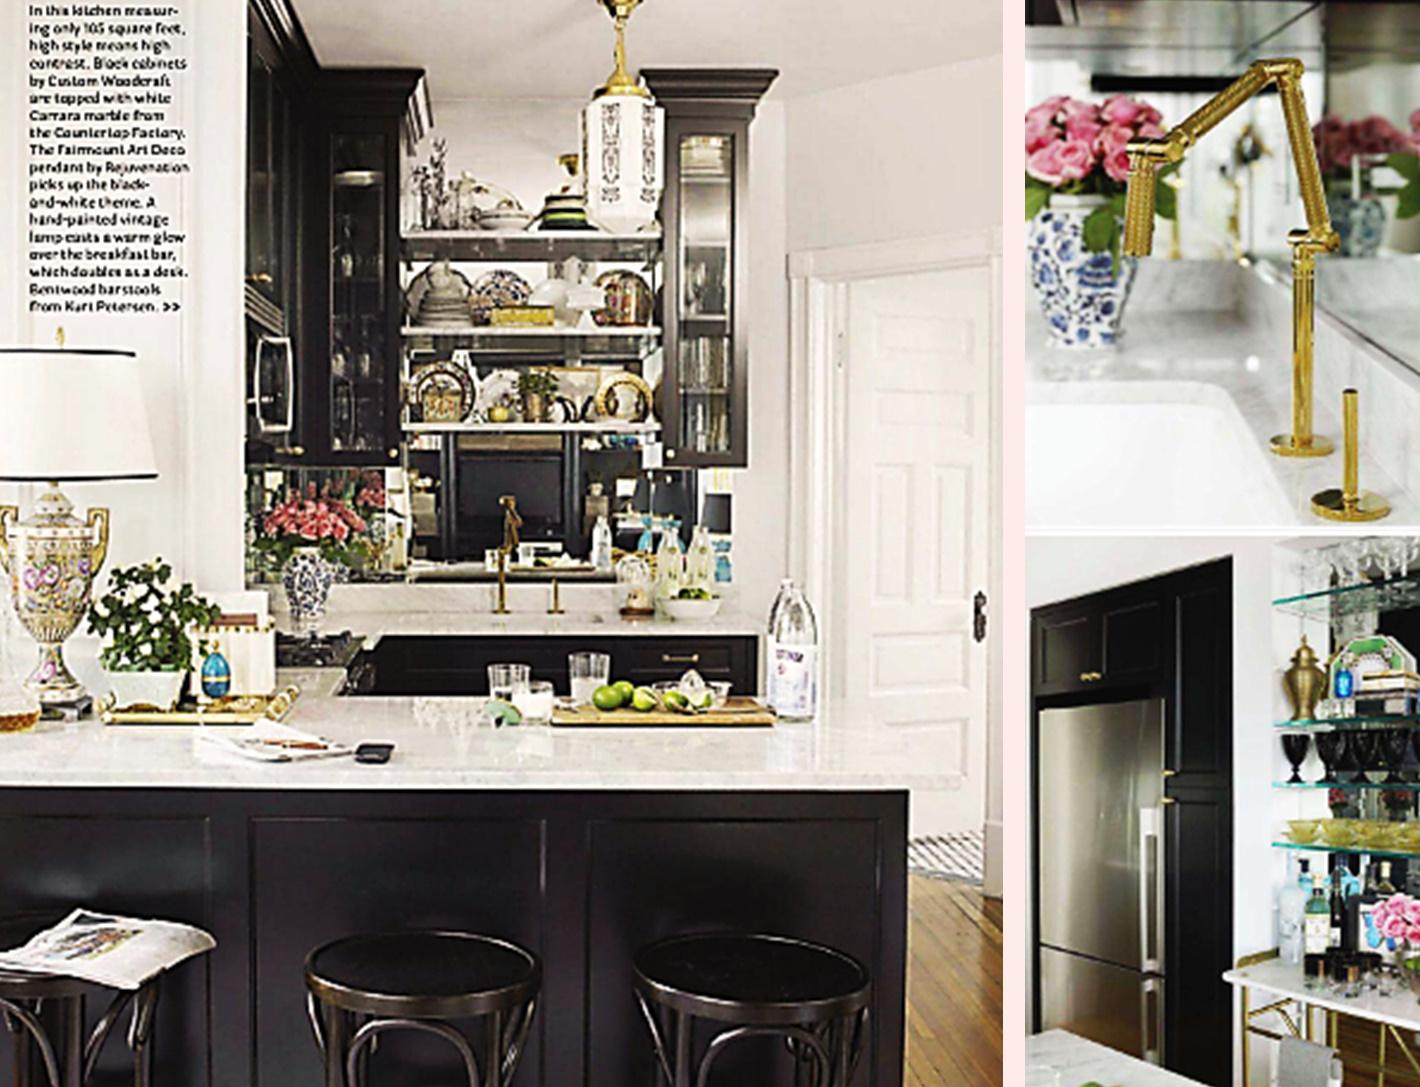 BOISERIE & C.: Cucine: 25 Soluzioni Per Piccoli Spazi Ma Scenografiche #967D35 1420 1087 Cucine Lube Per Piccoli Spazi